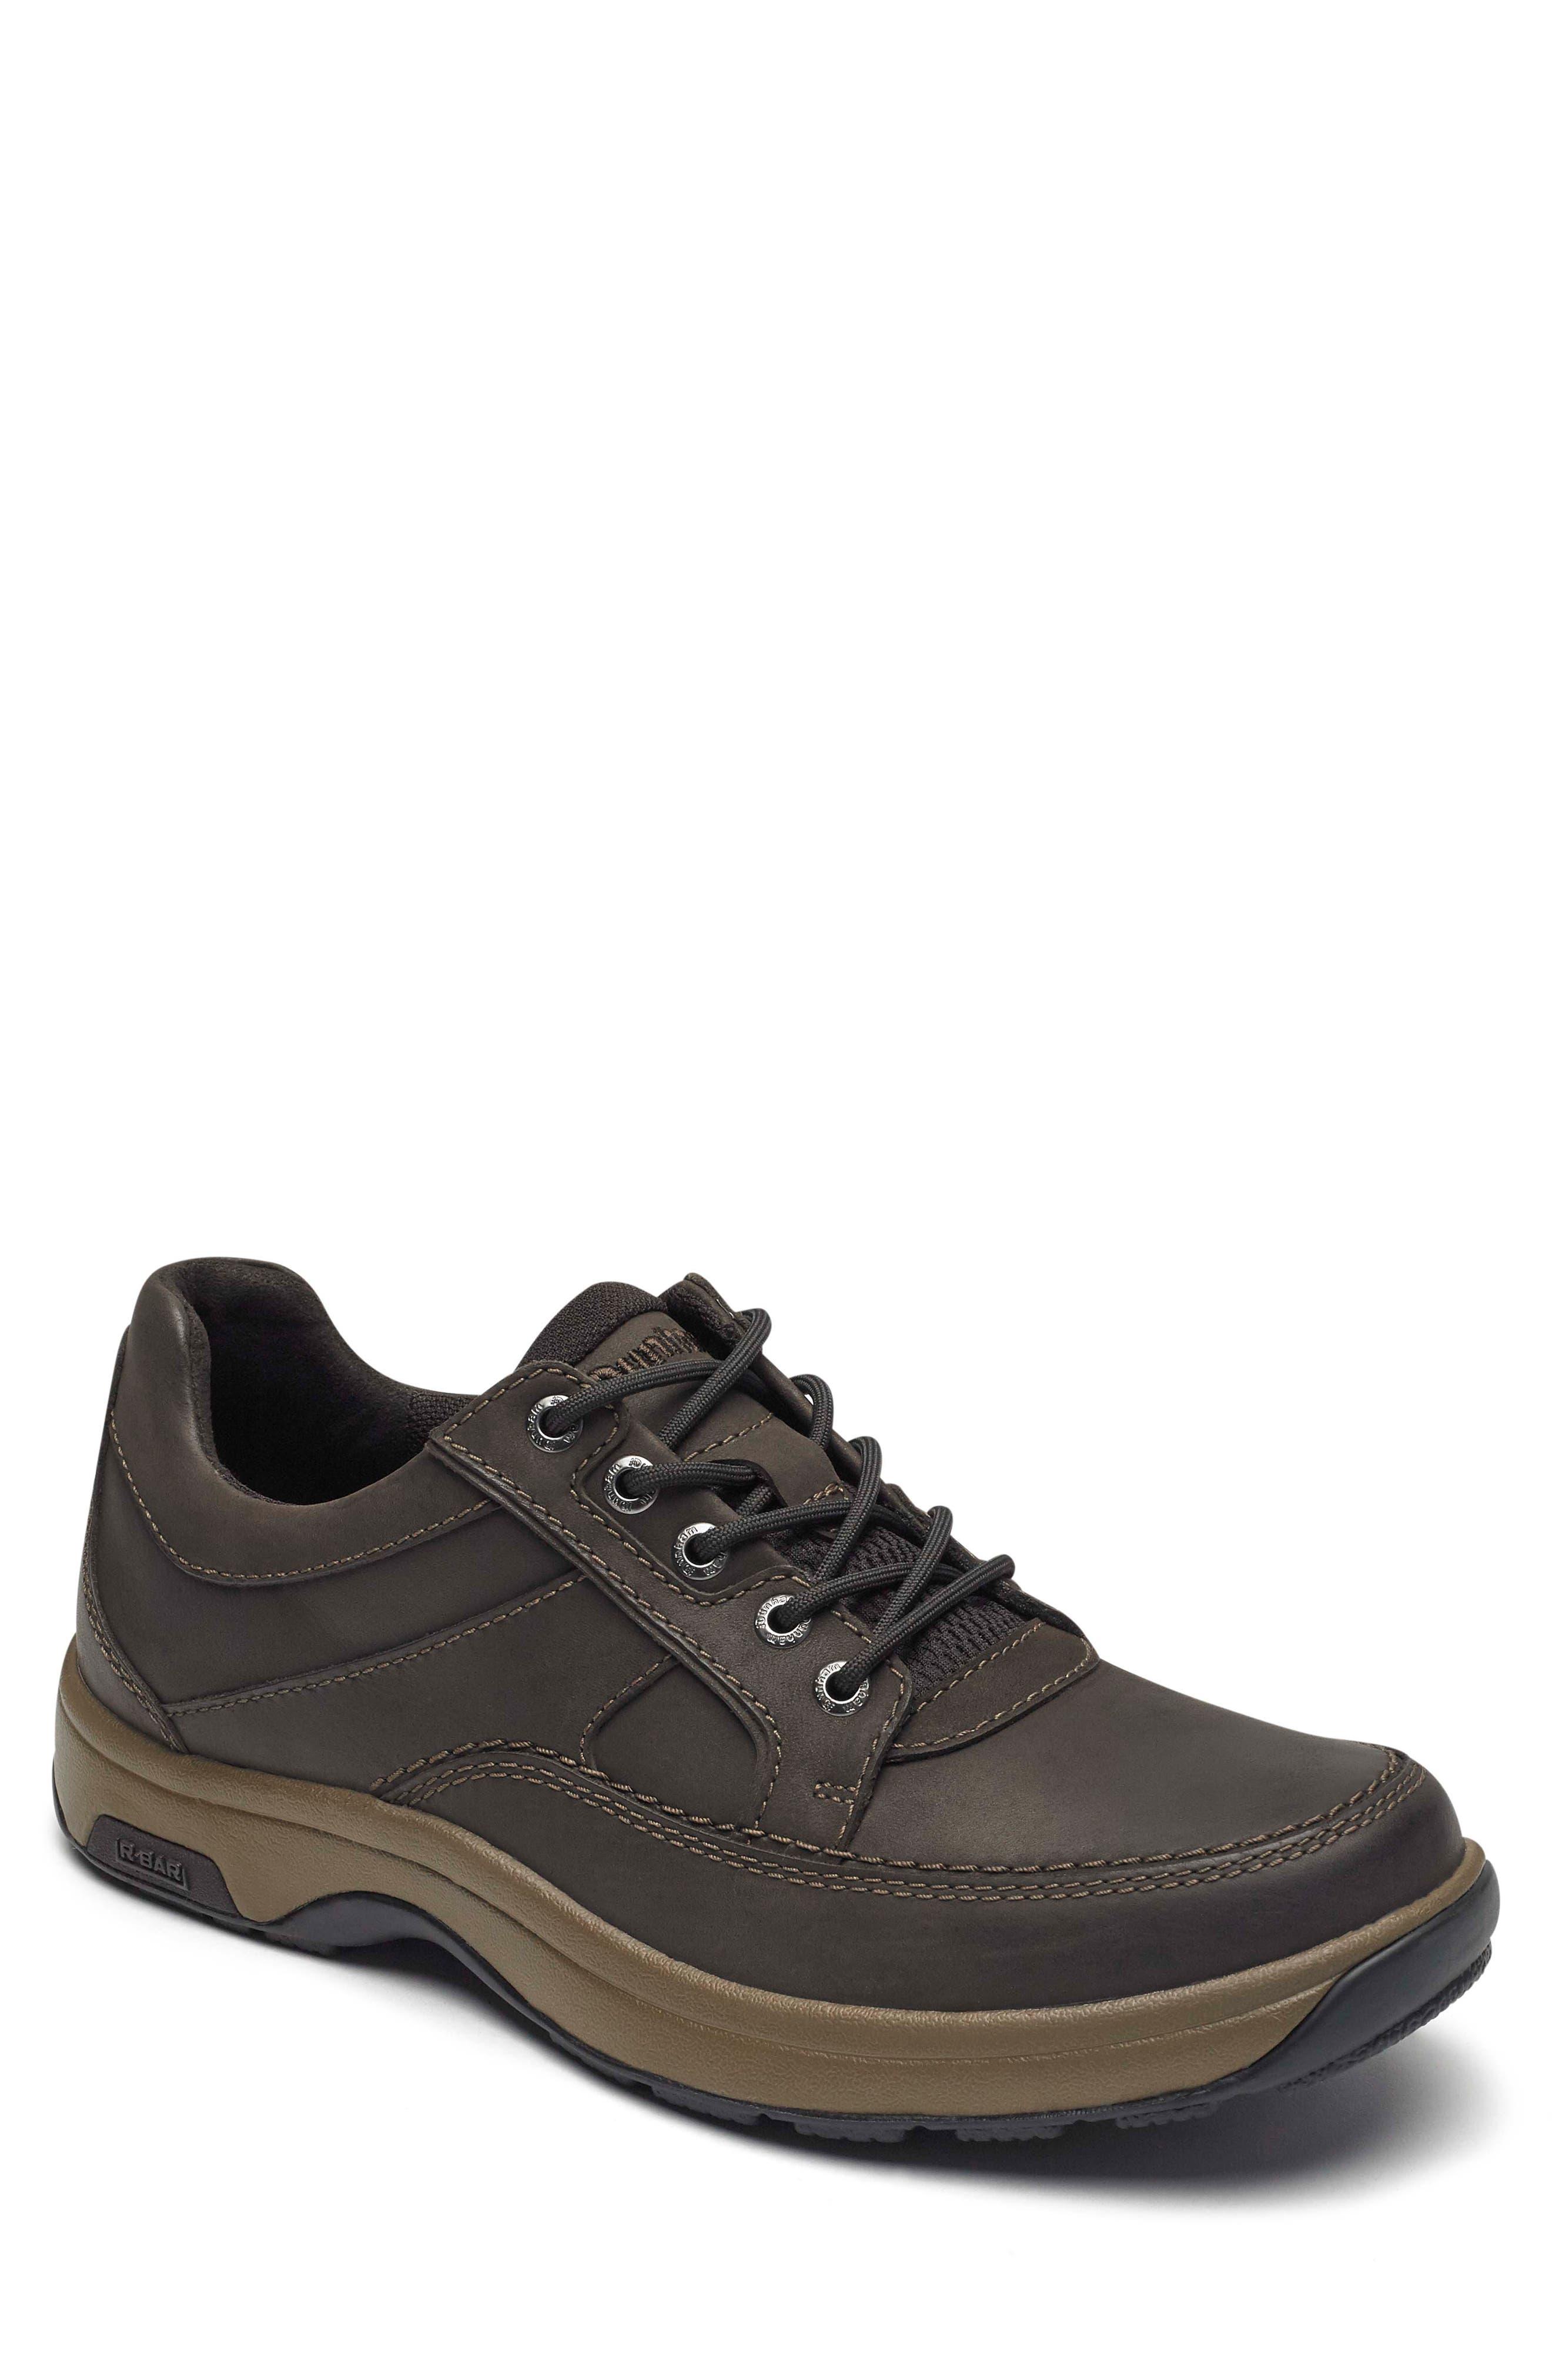 Dunham Midland Waterproof Sneaker